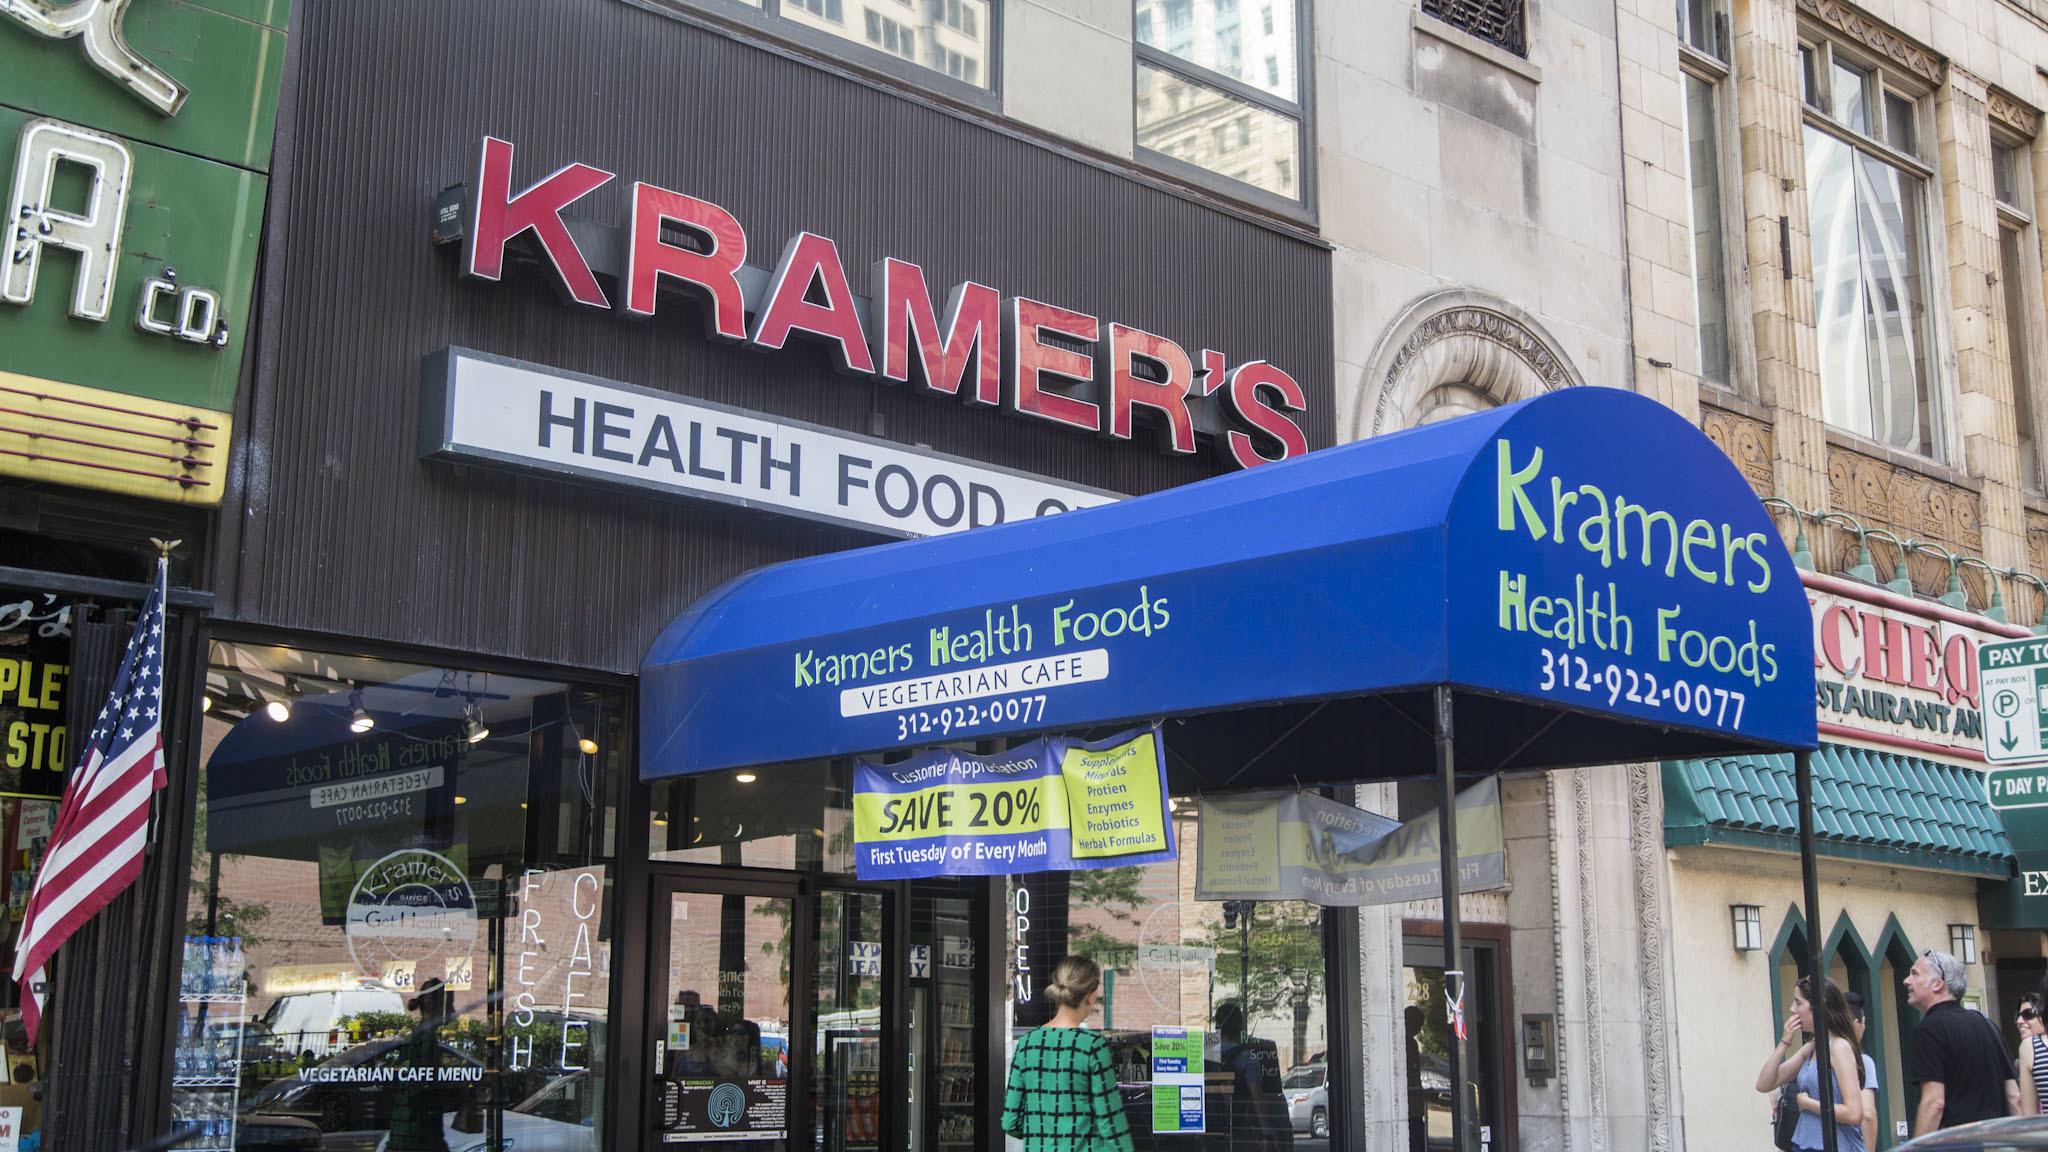 Kramer's Health Foods